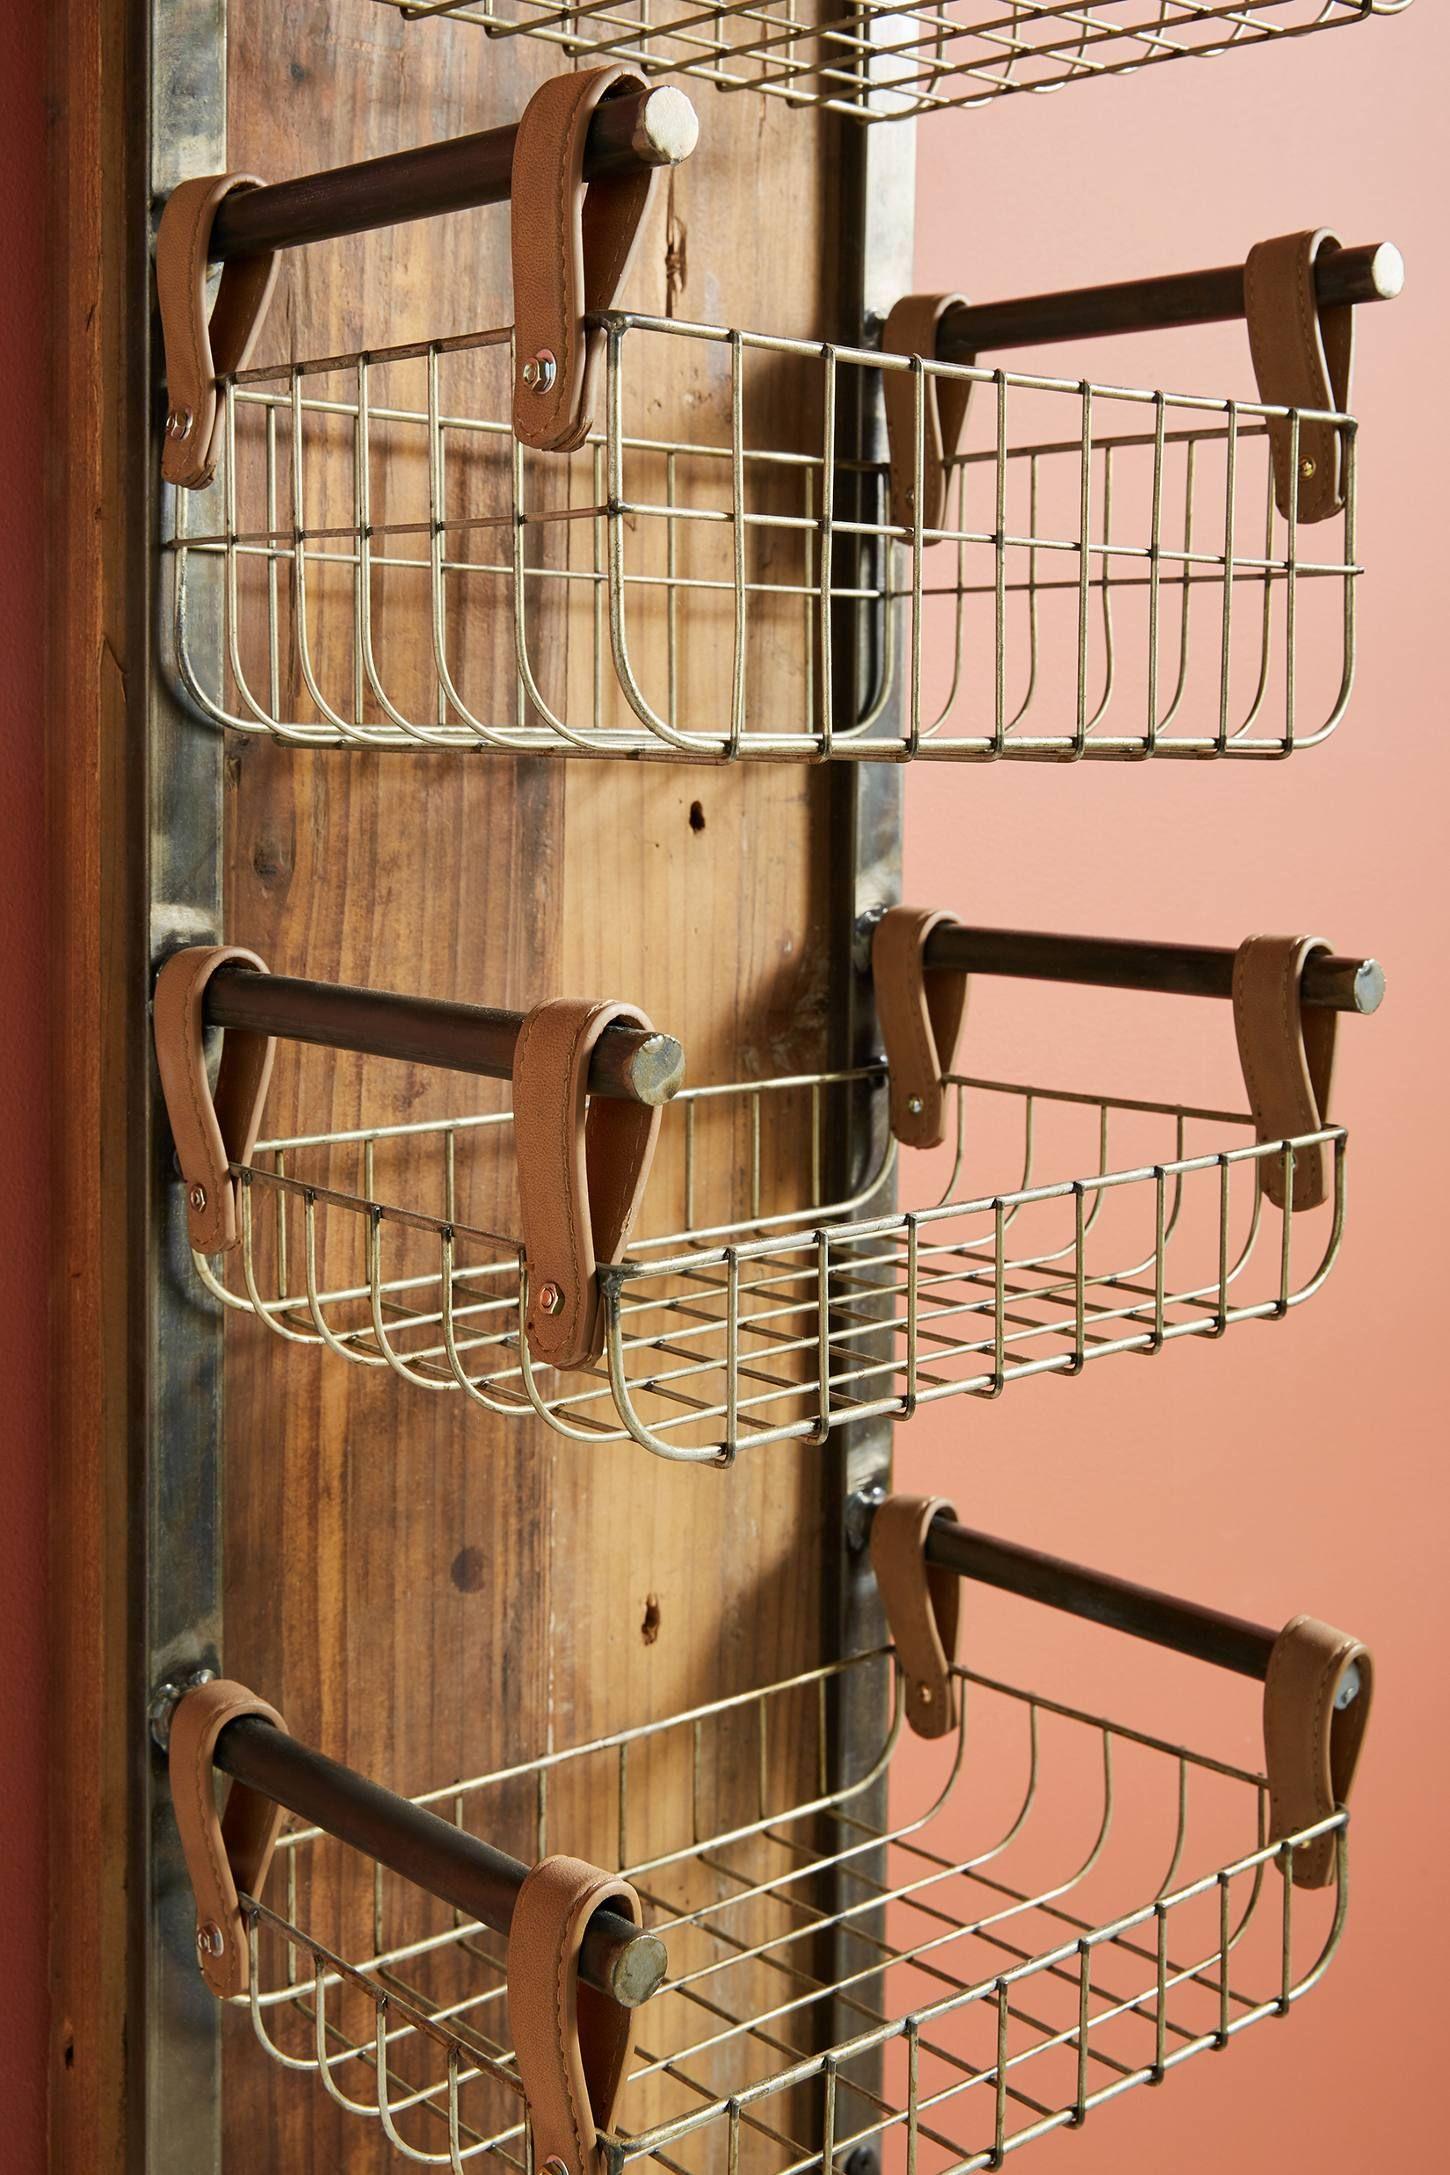 New Storage & Organizing Products